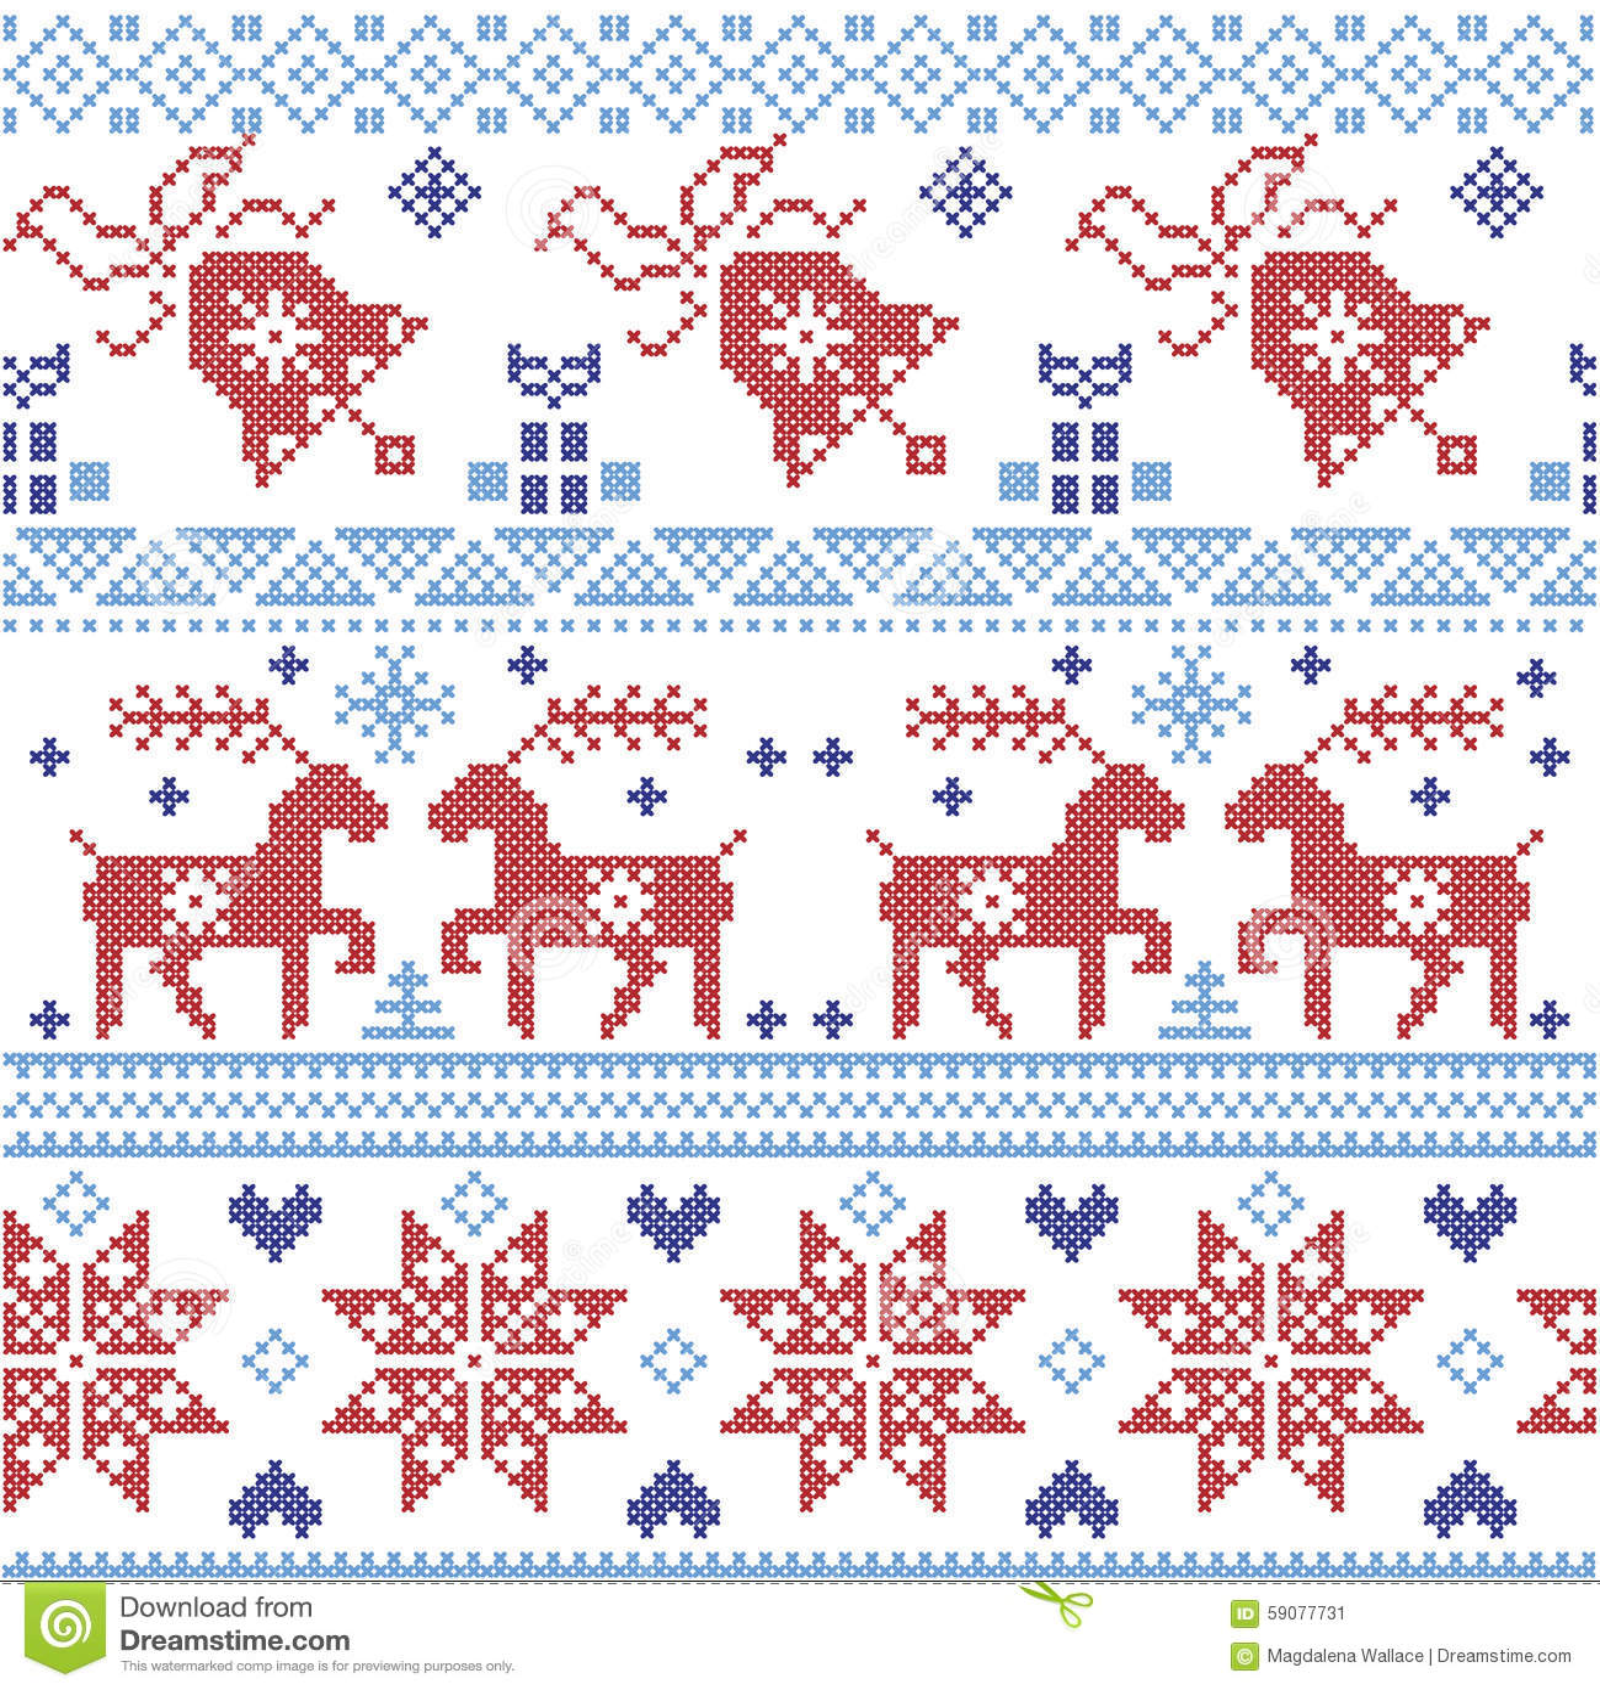 Dark And Light Blue And Red Scnadinavian Christmas Cross ...